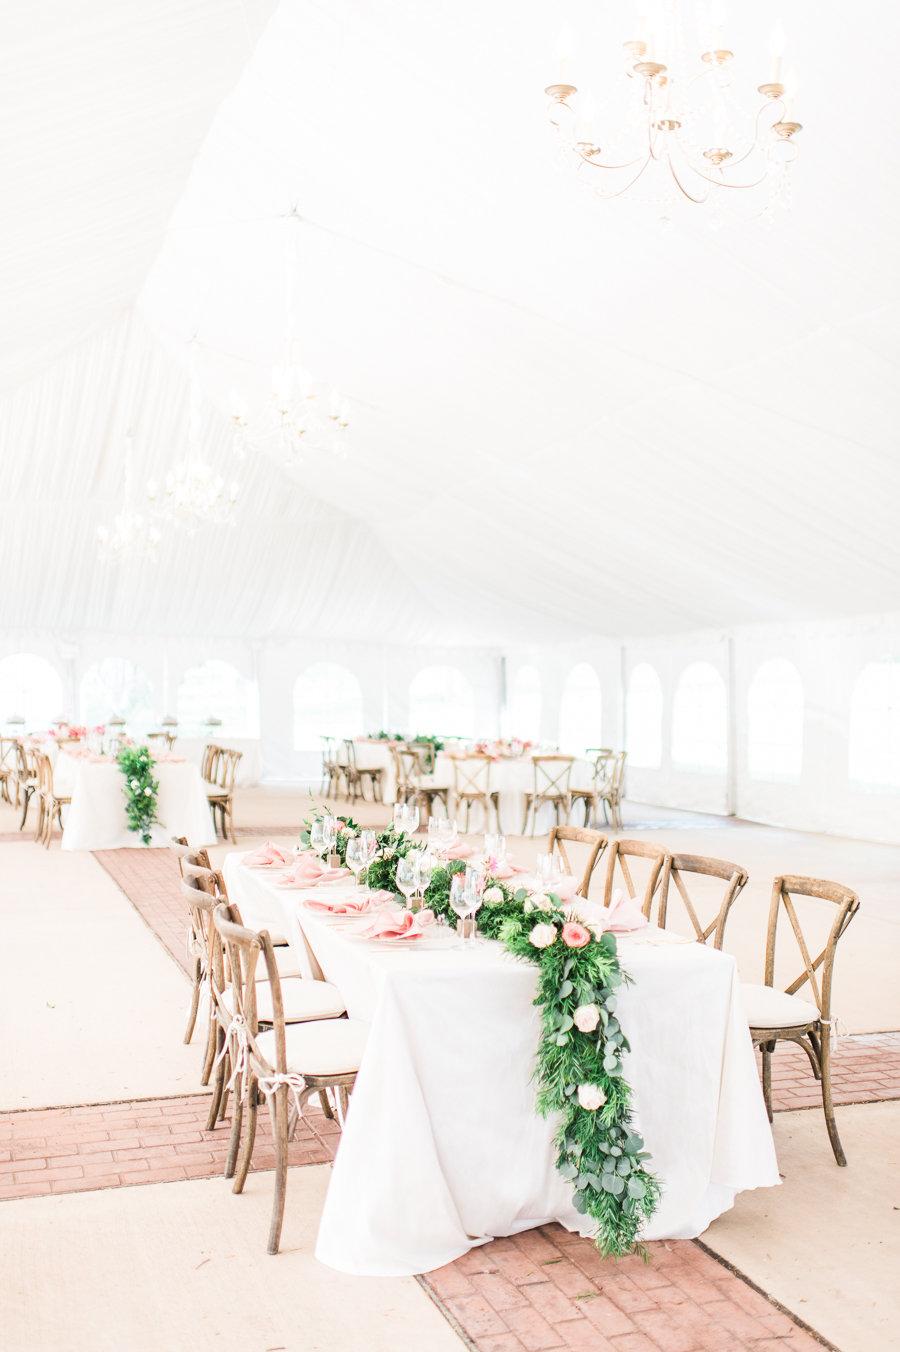 peony-garland-runner-for-wedding-reception-third-clover-stephanie-messick-photography-kim-newton-weddings